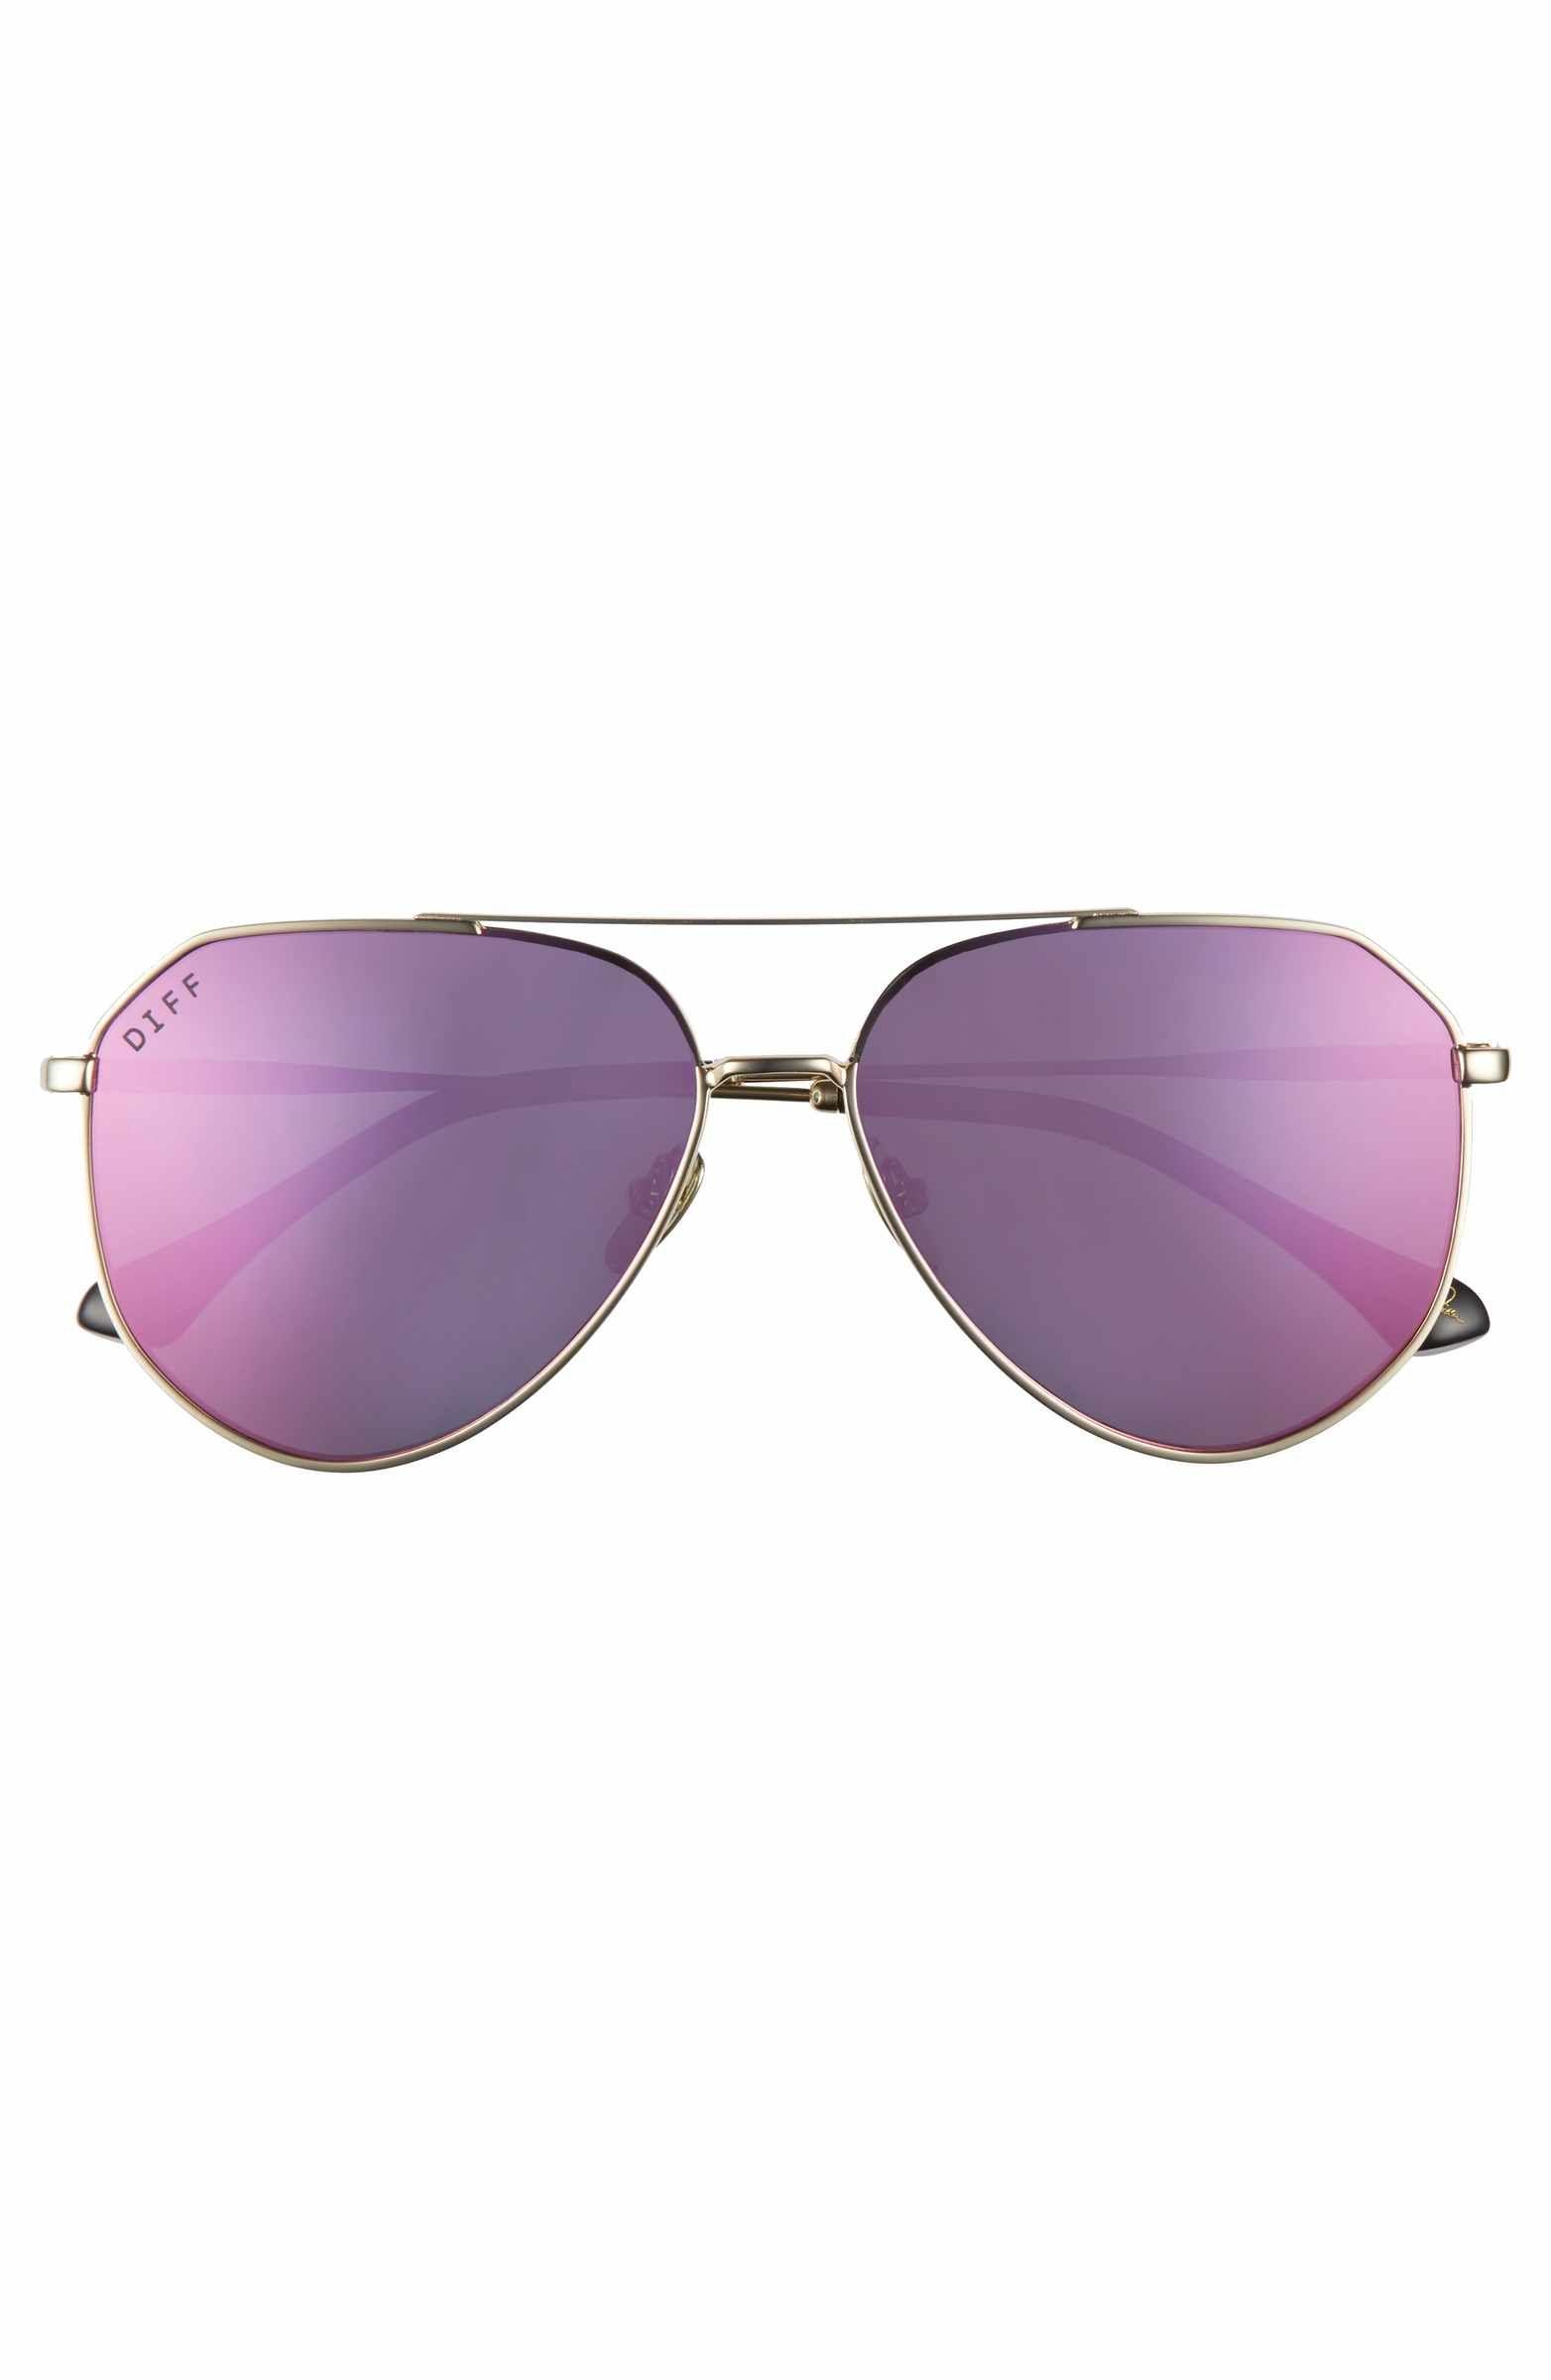 6dc9bd1dbd6ed Main Image - DIFF x Jessie James Decker Dash 61mm Polarized Aviator  Sunglasses